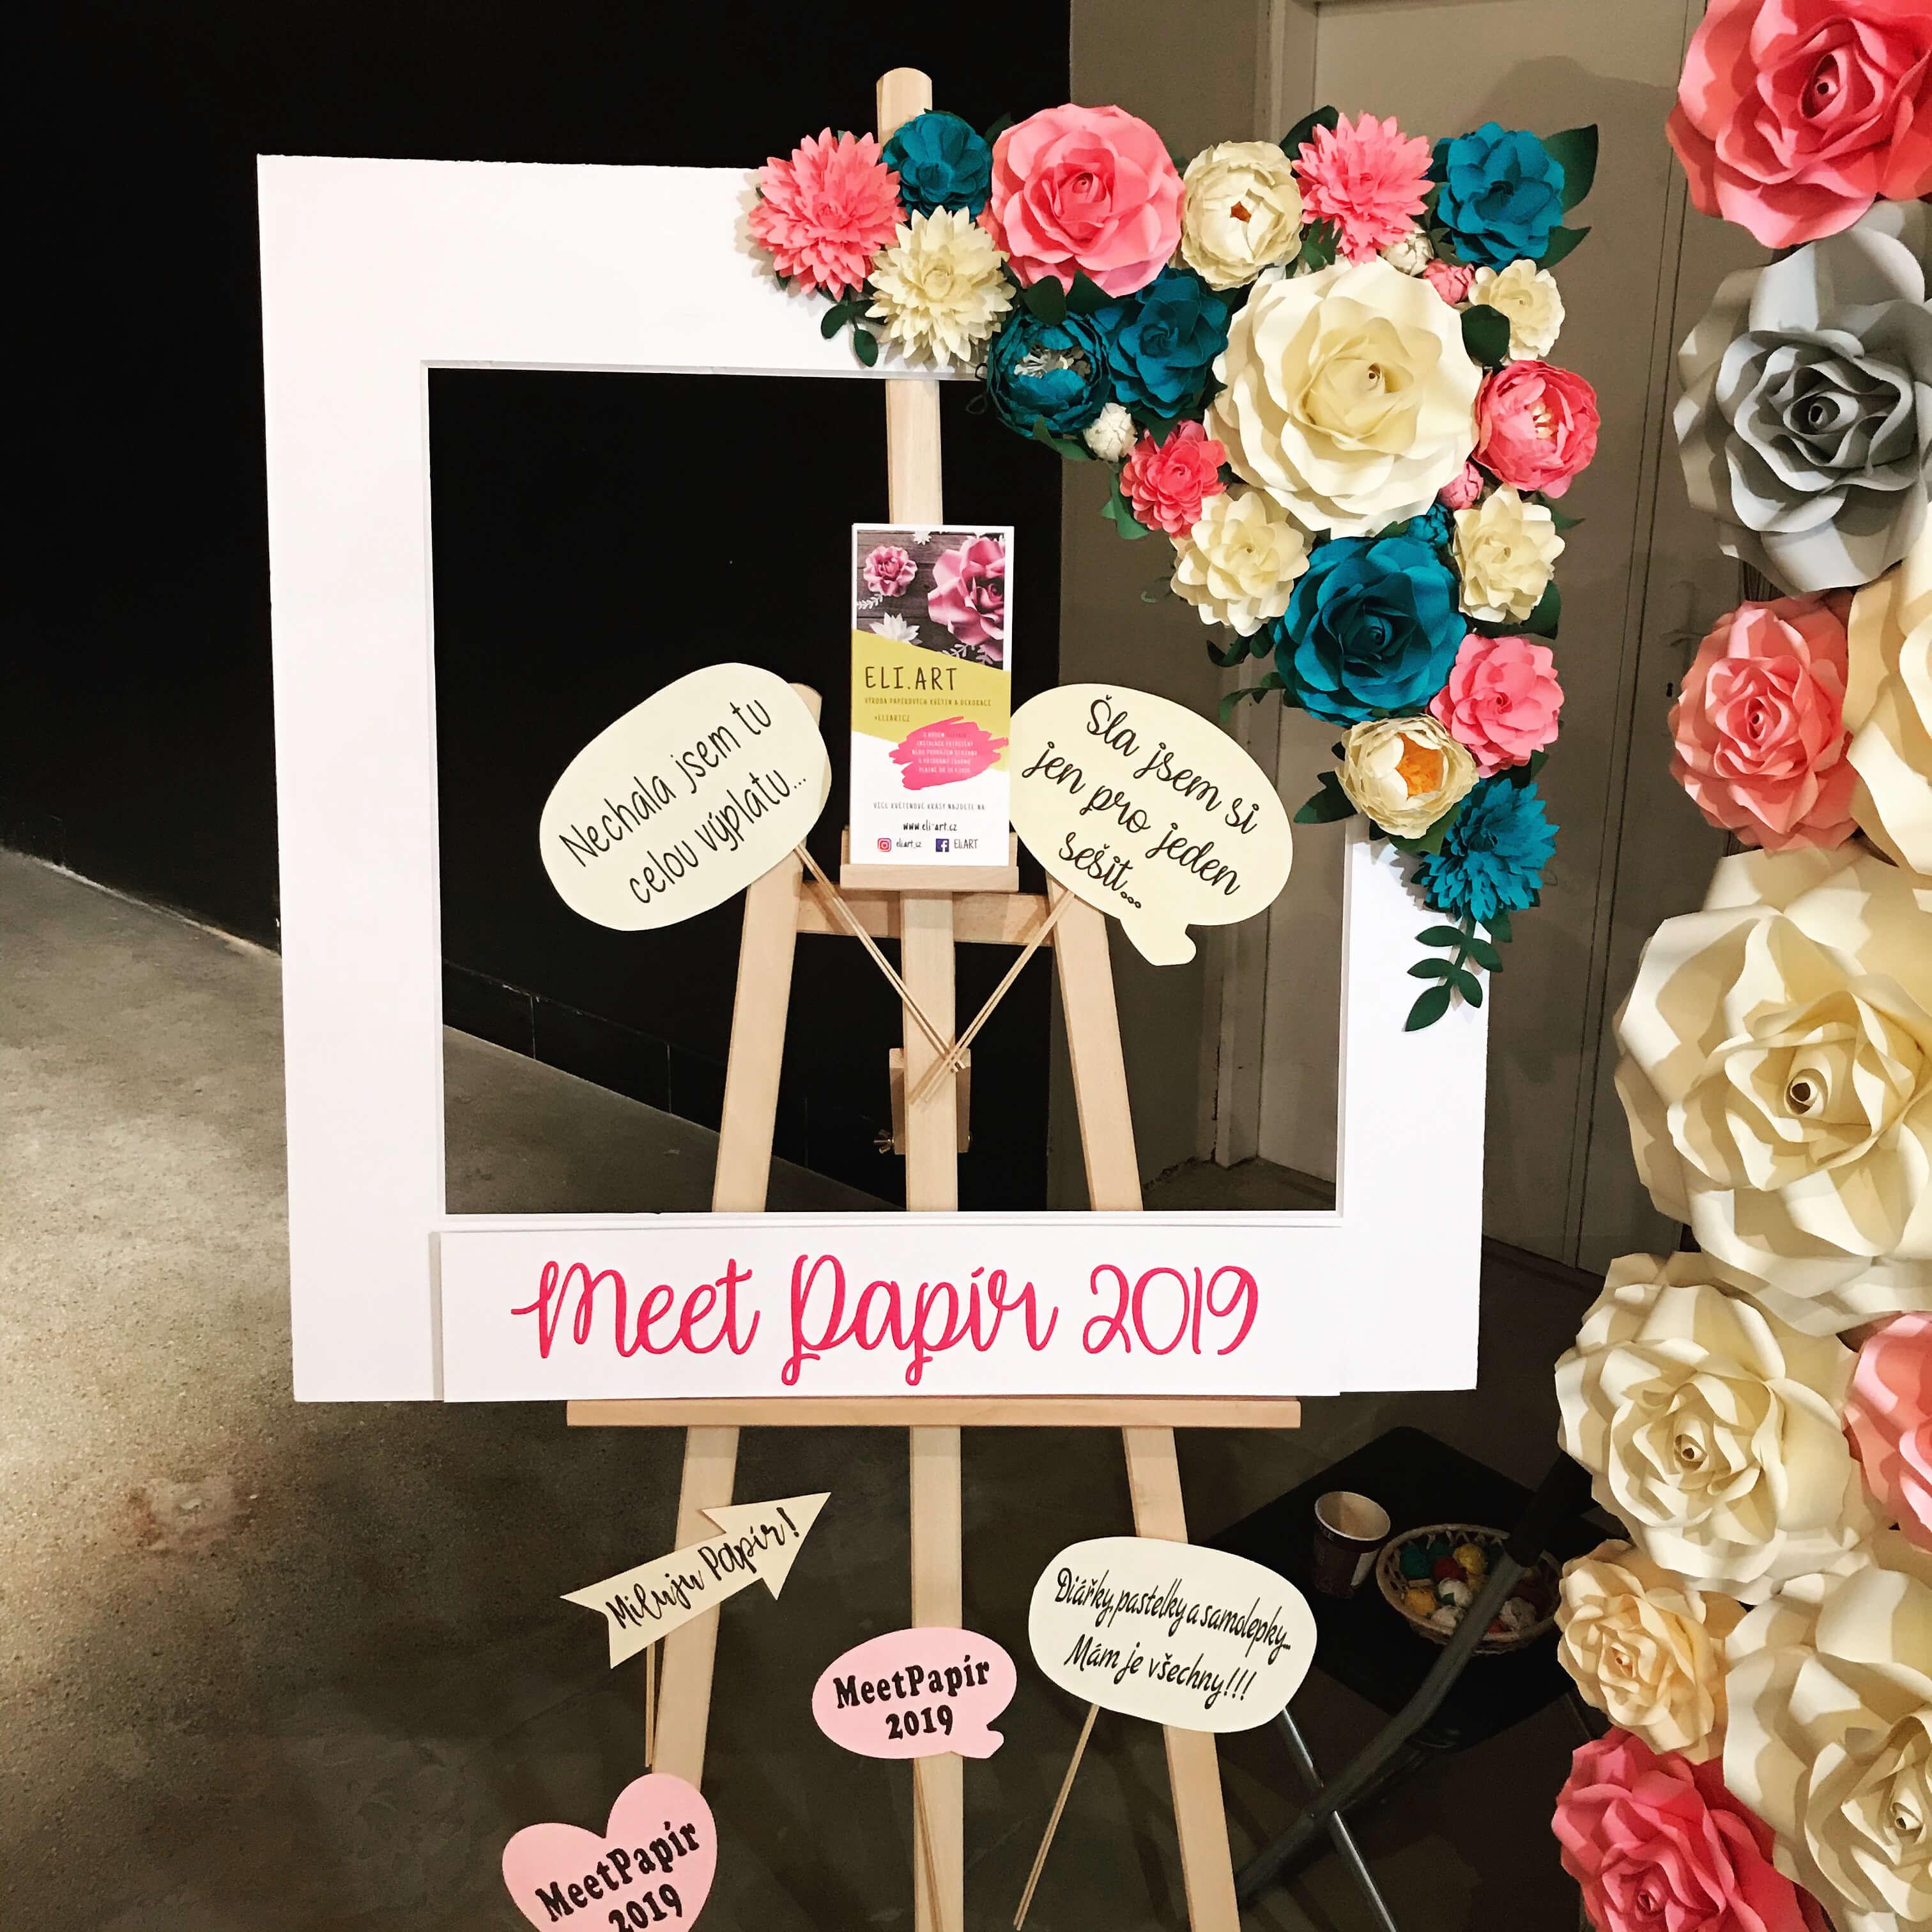 MeetPapír 2019